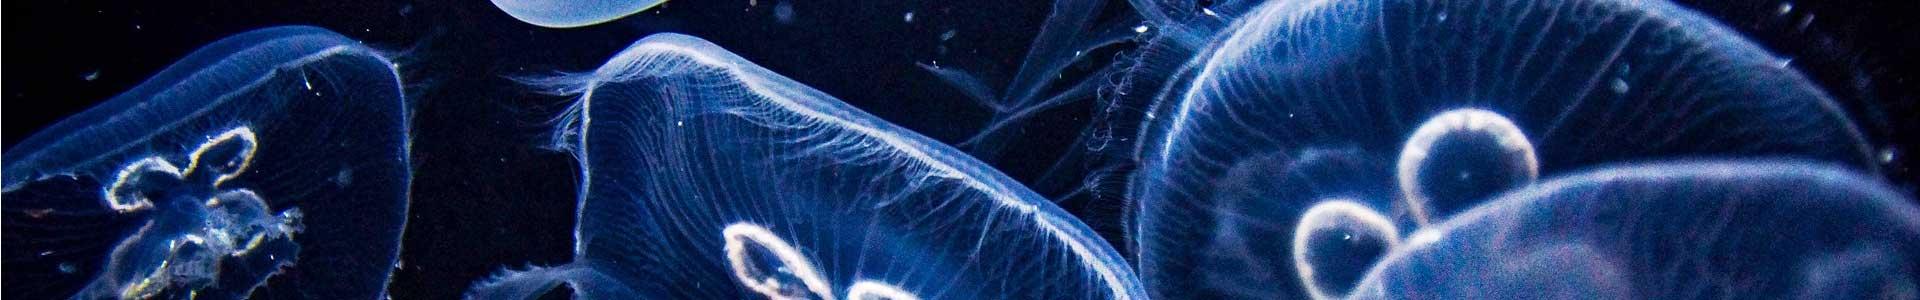 Aquaristik-Test